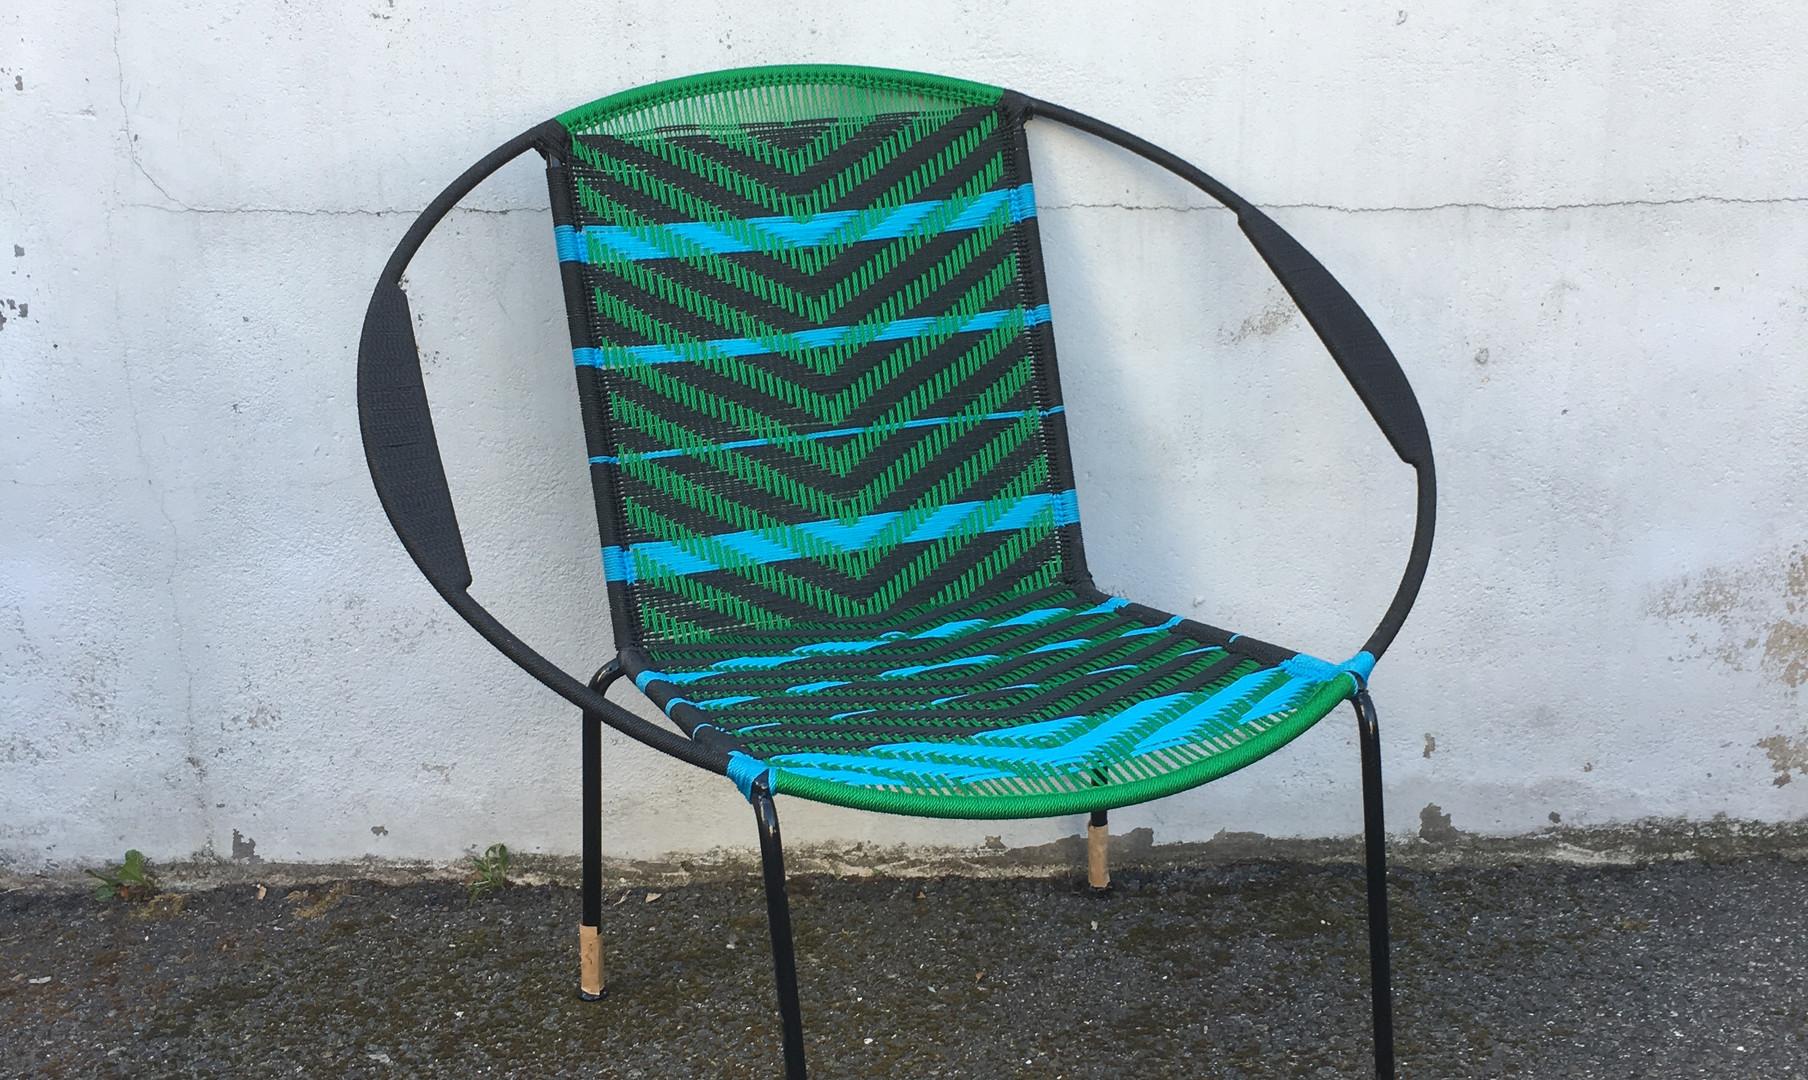 Noir / vert / bandes turquoise